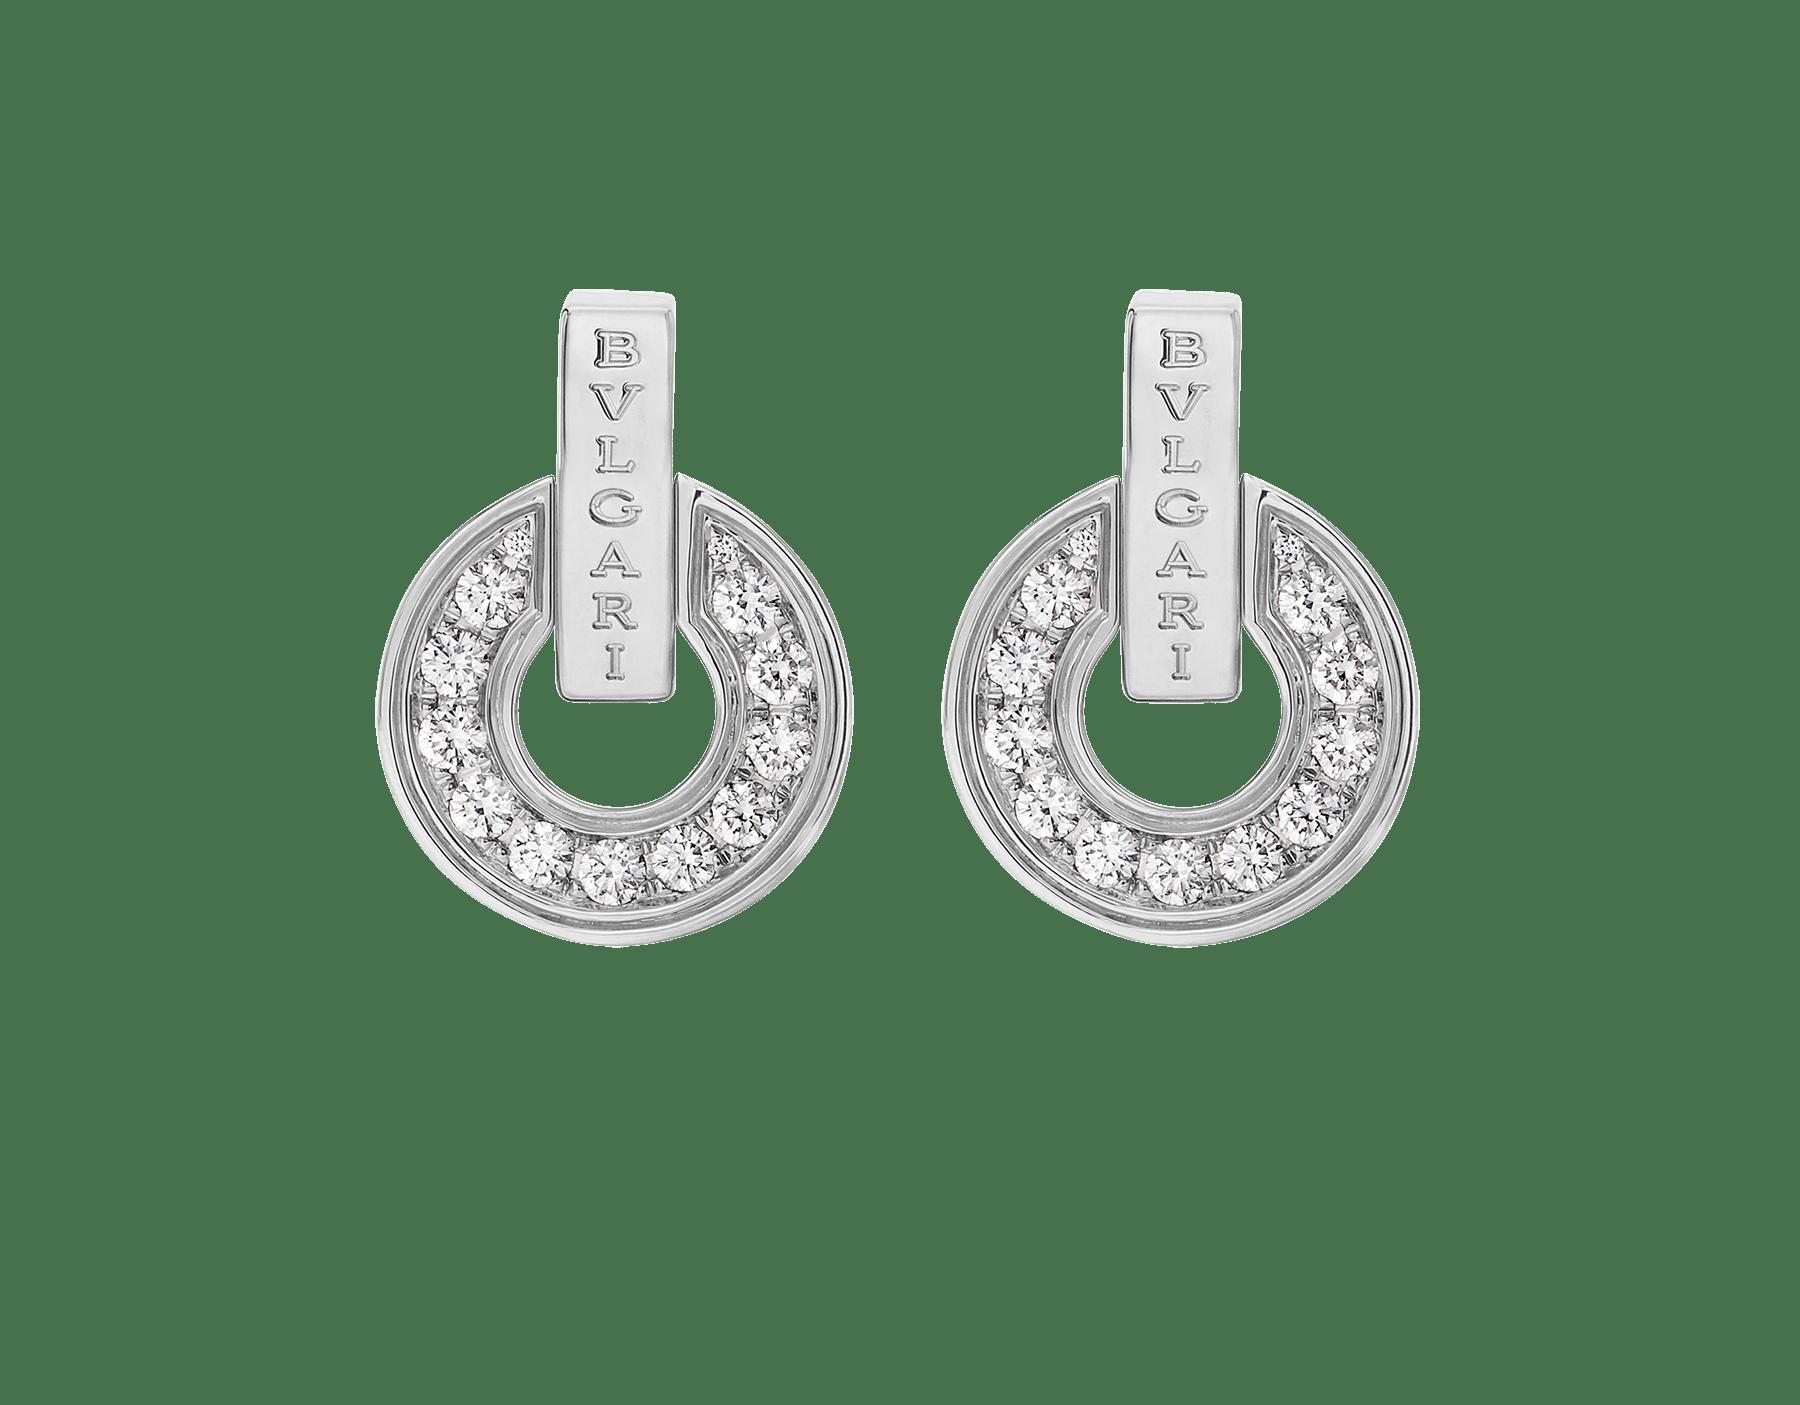 BVLGARI BVLGARI系列白色18K金镂空耳环,饰以全密镶钻石 357940 image 1